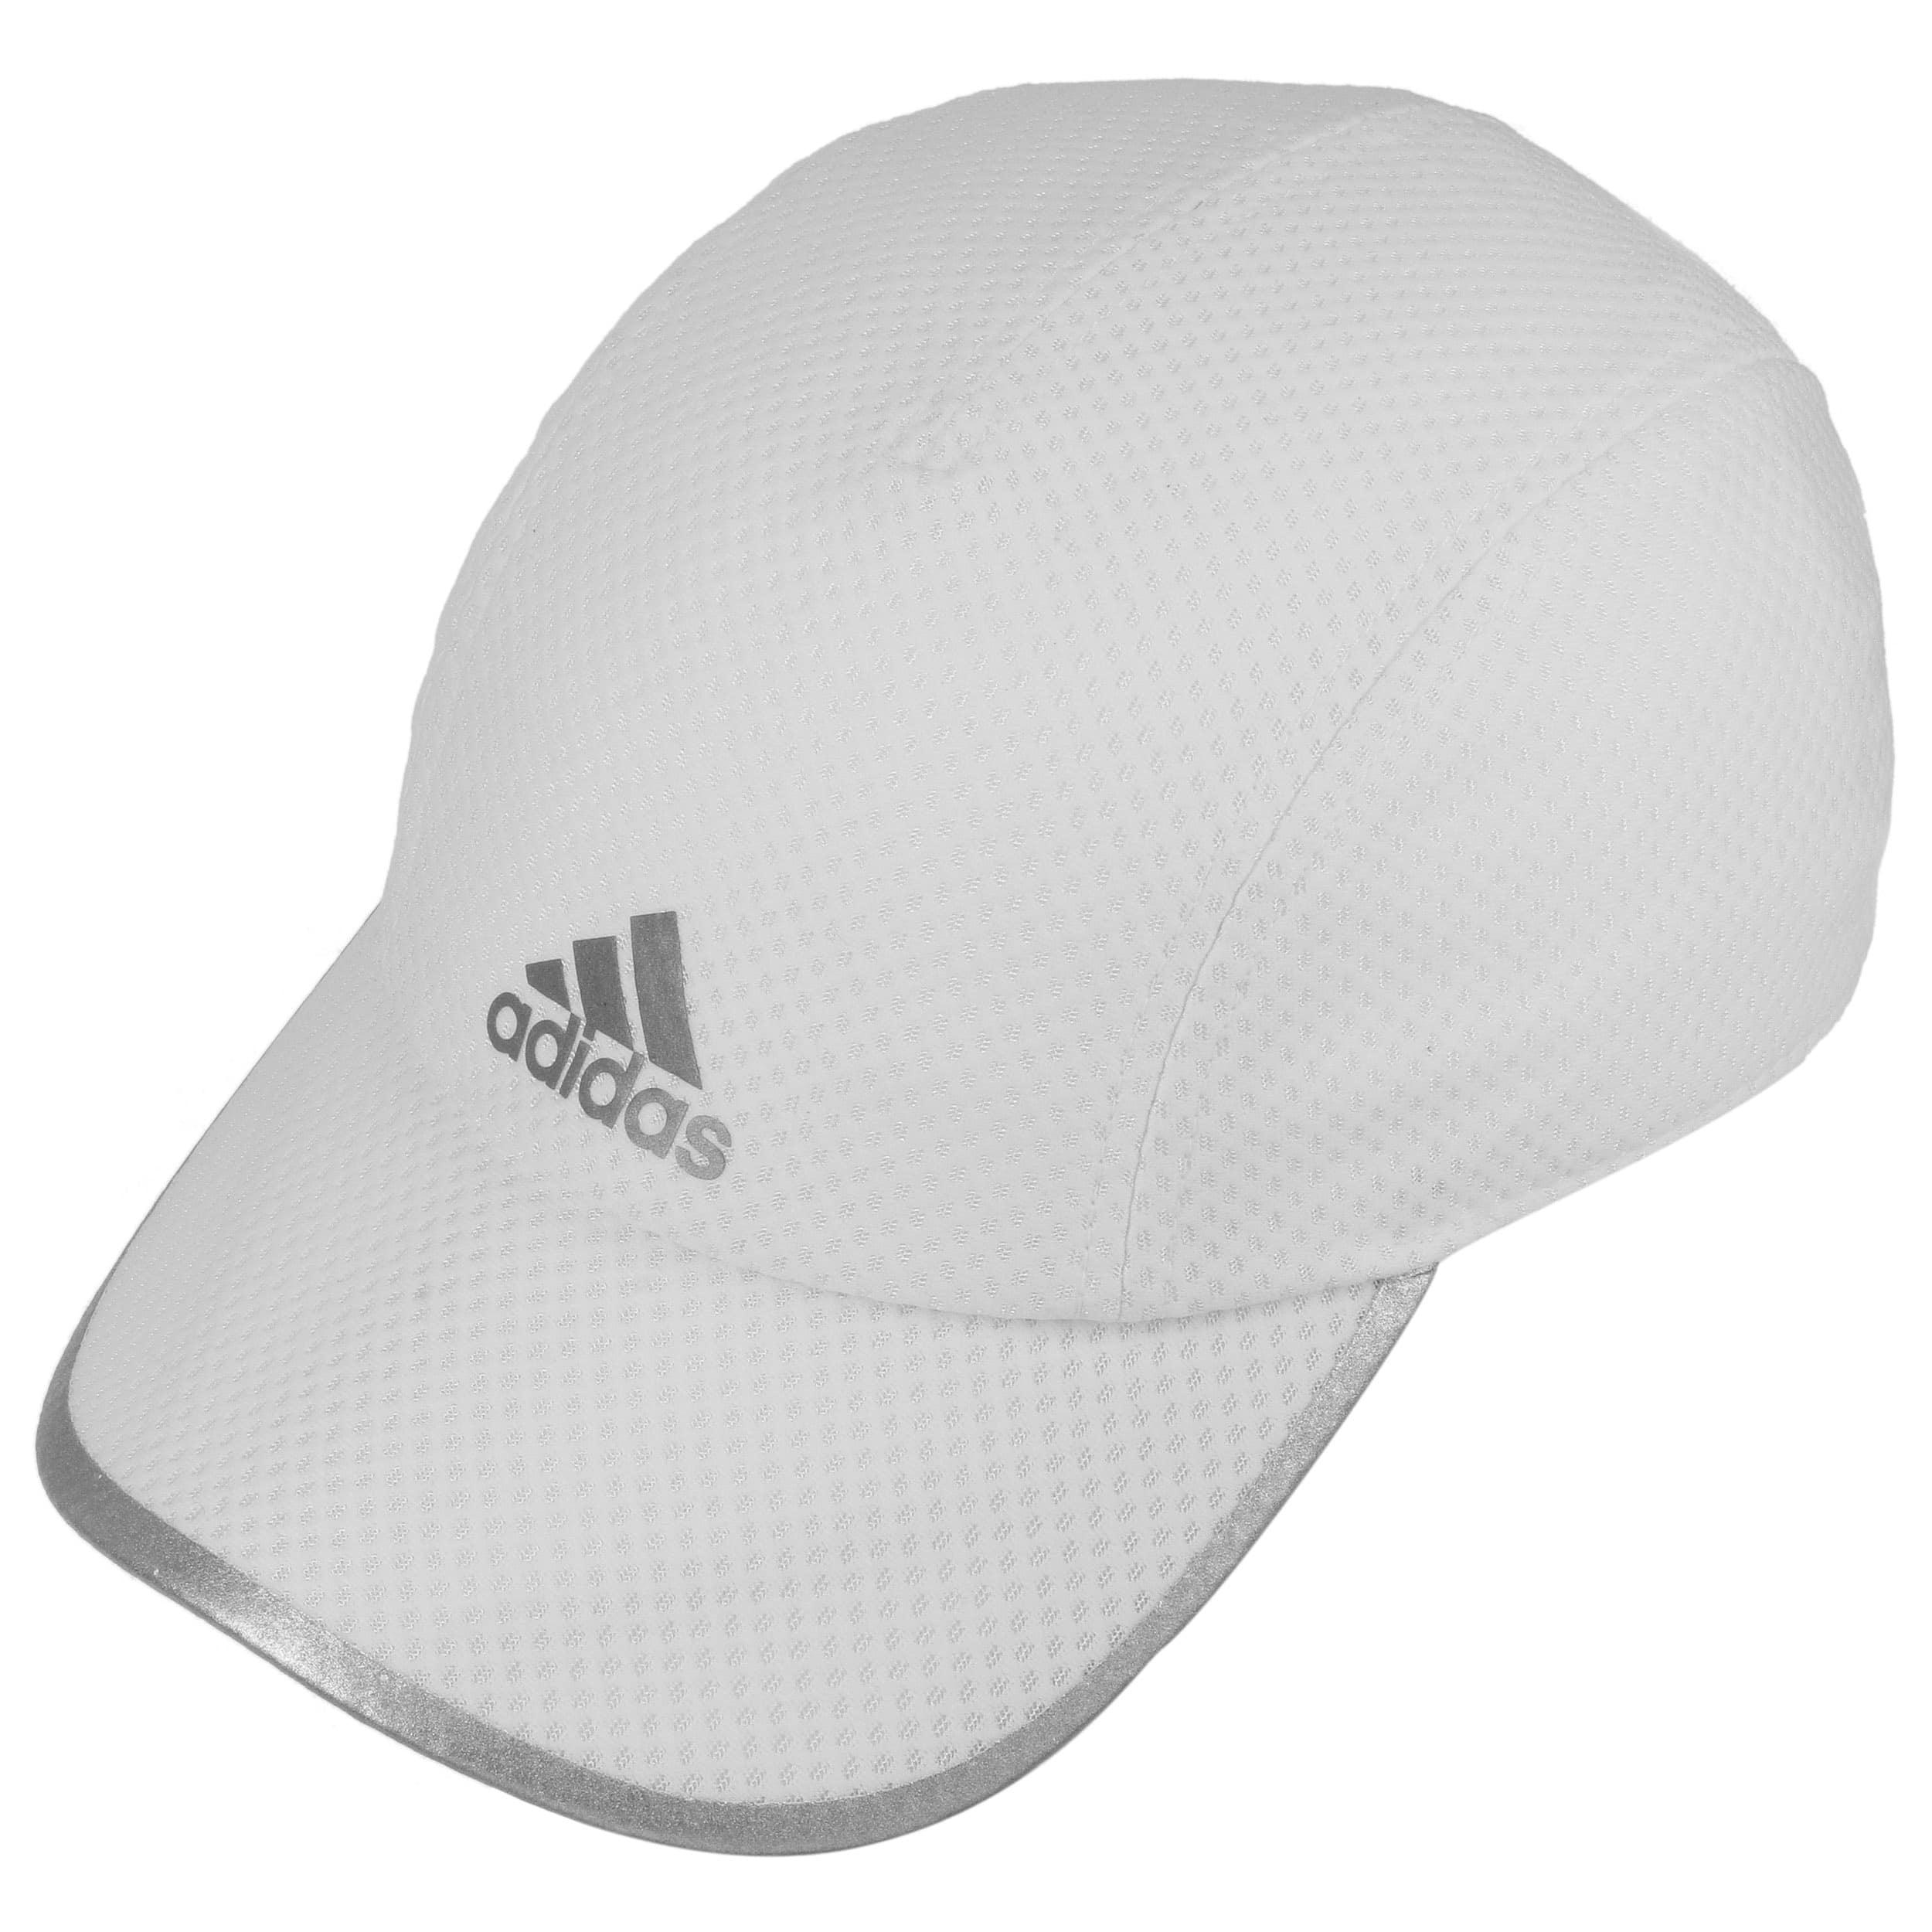 af418511b3a ... R96 Climacool Cap by adidas - white 1 ...